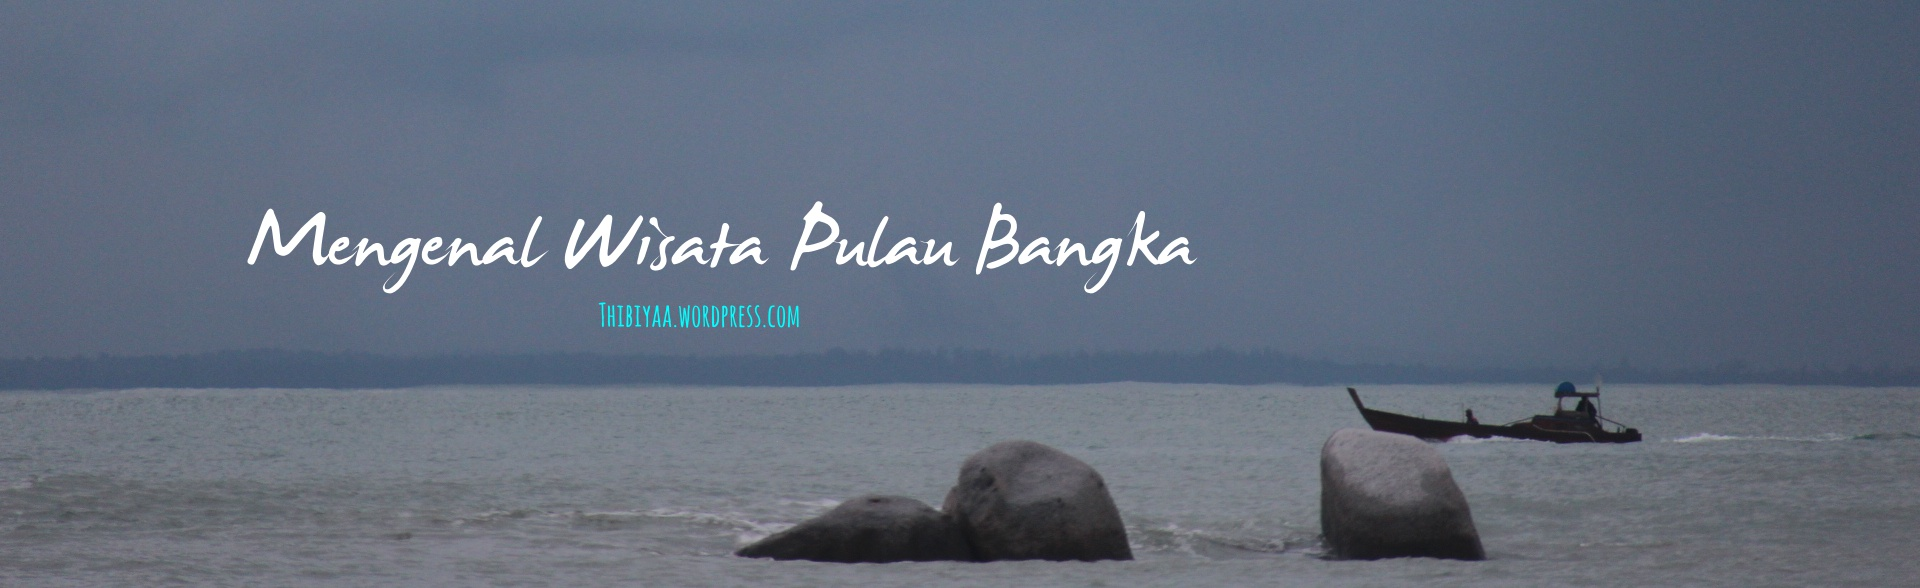 Mengenal Wisata Pulau Bangka